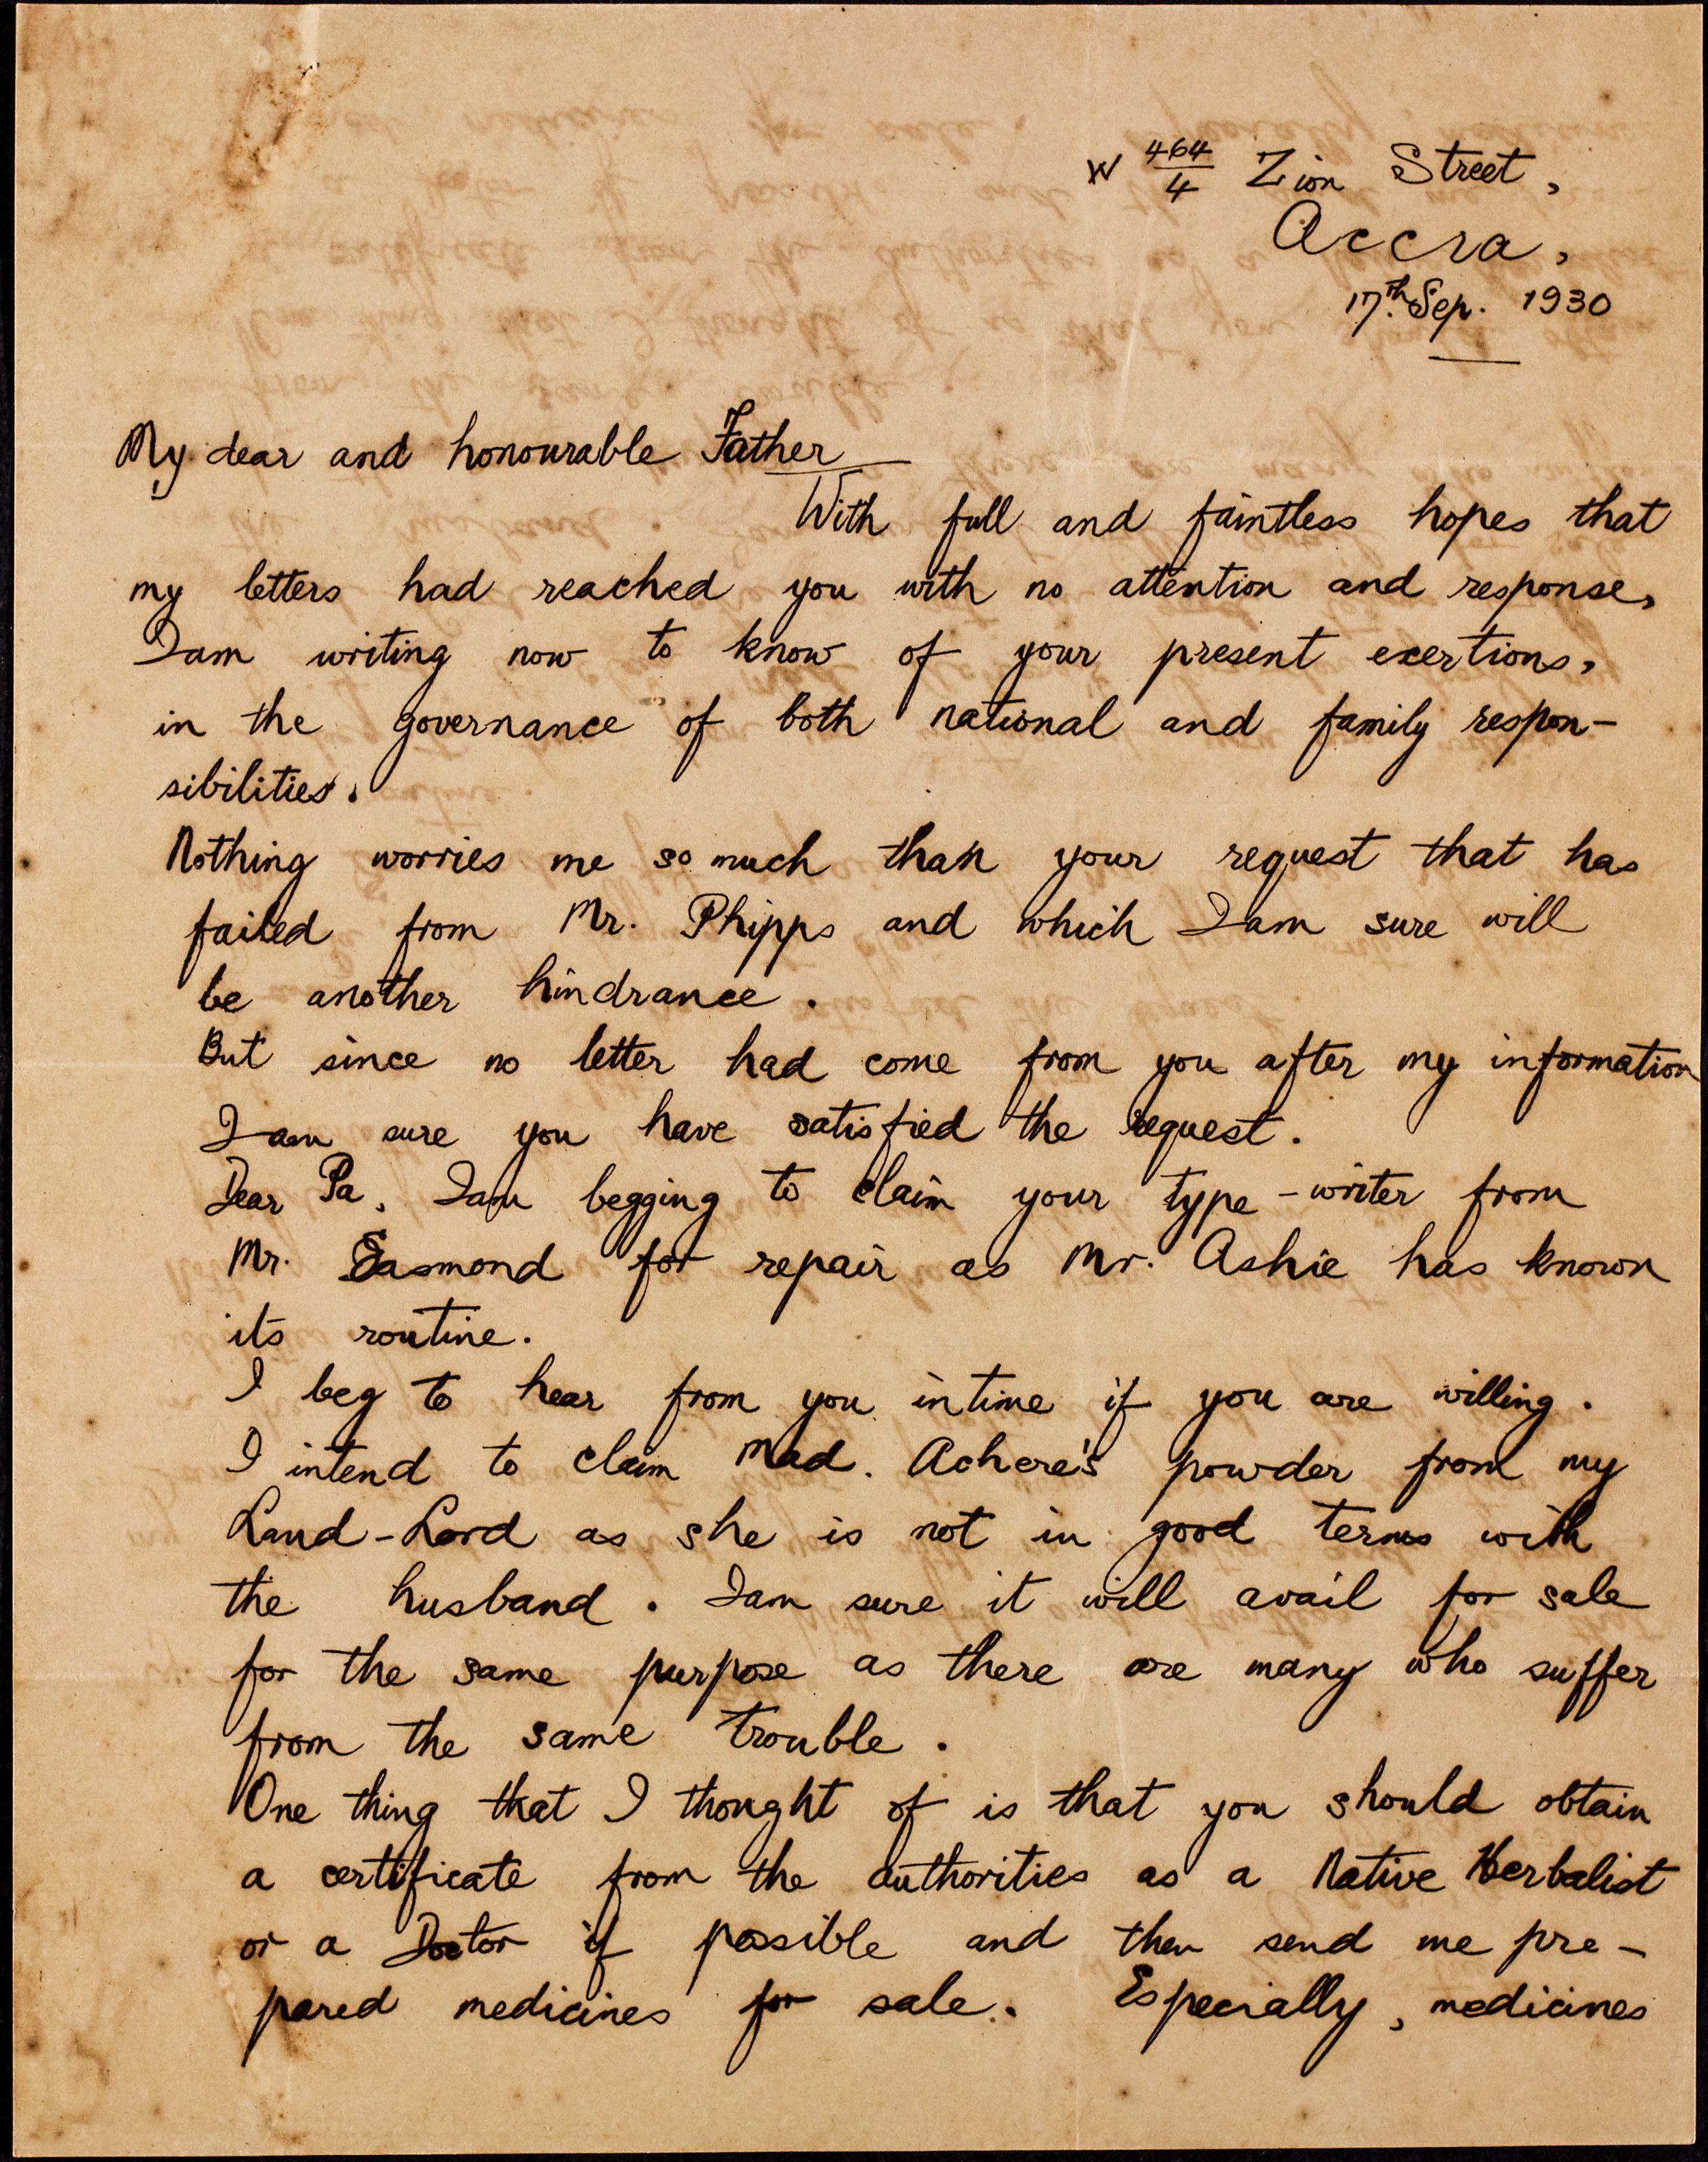 Letter from Moses Adamah Jnr to Togbui Adamah II